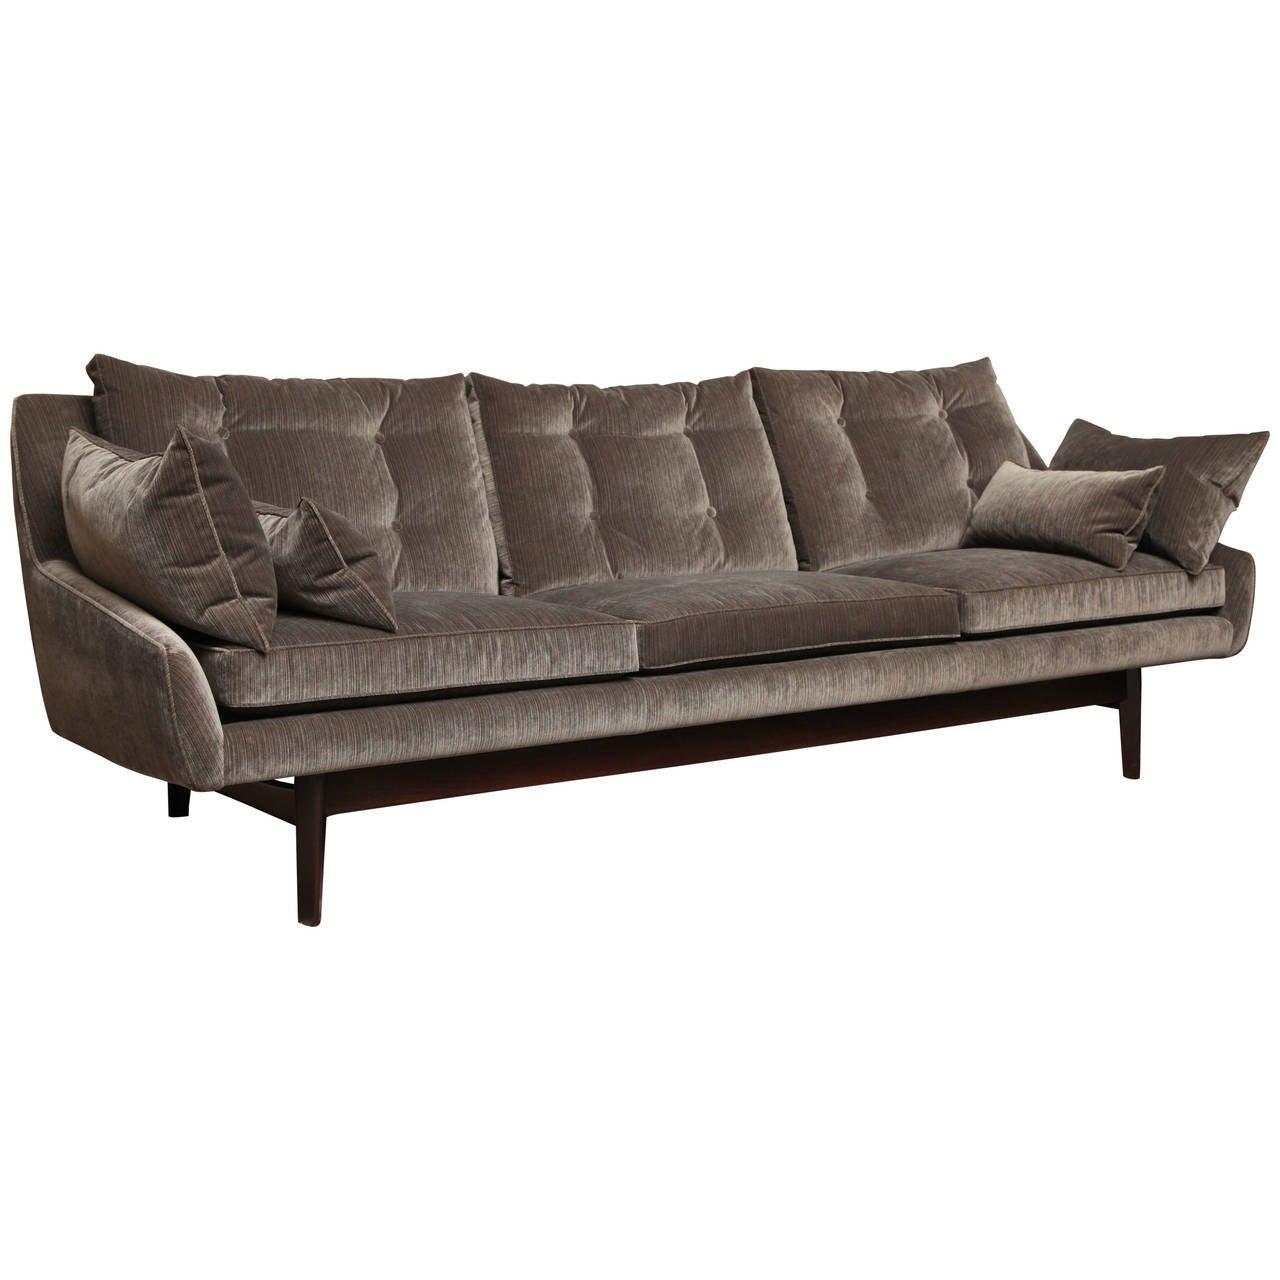 Tufted Swedish Sofa At 1stdibs